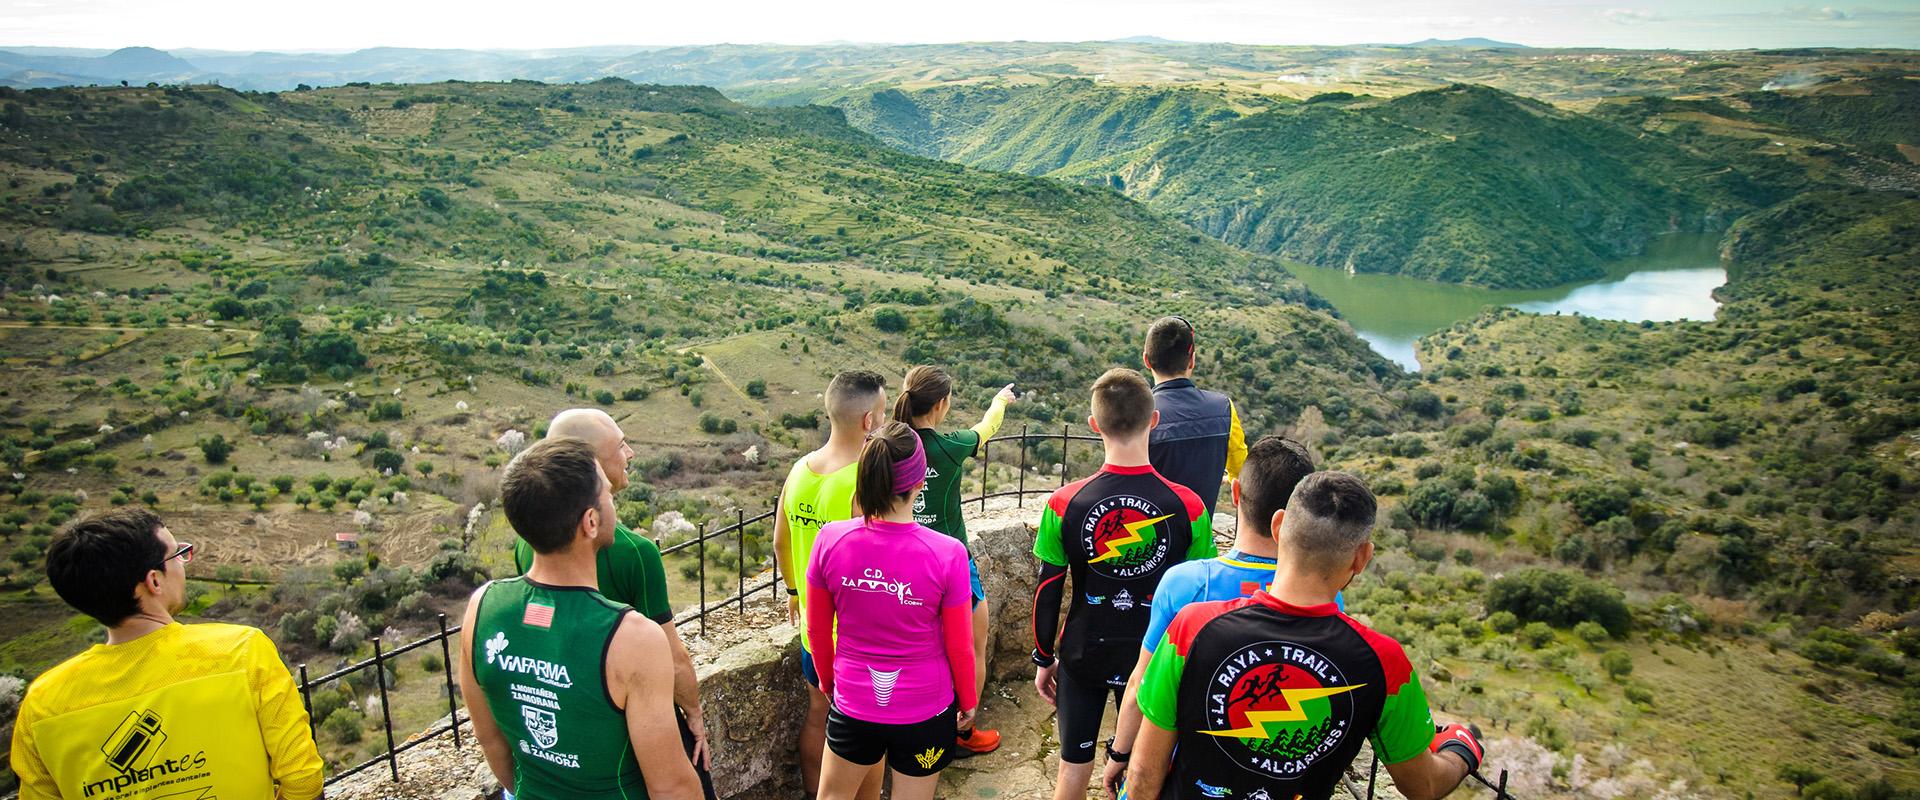 Slider 01 - Arribes Ocultos Trail